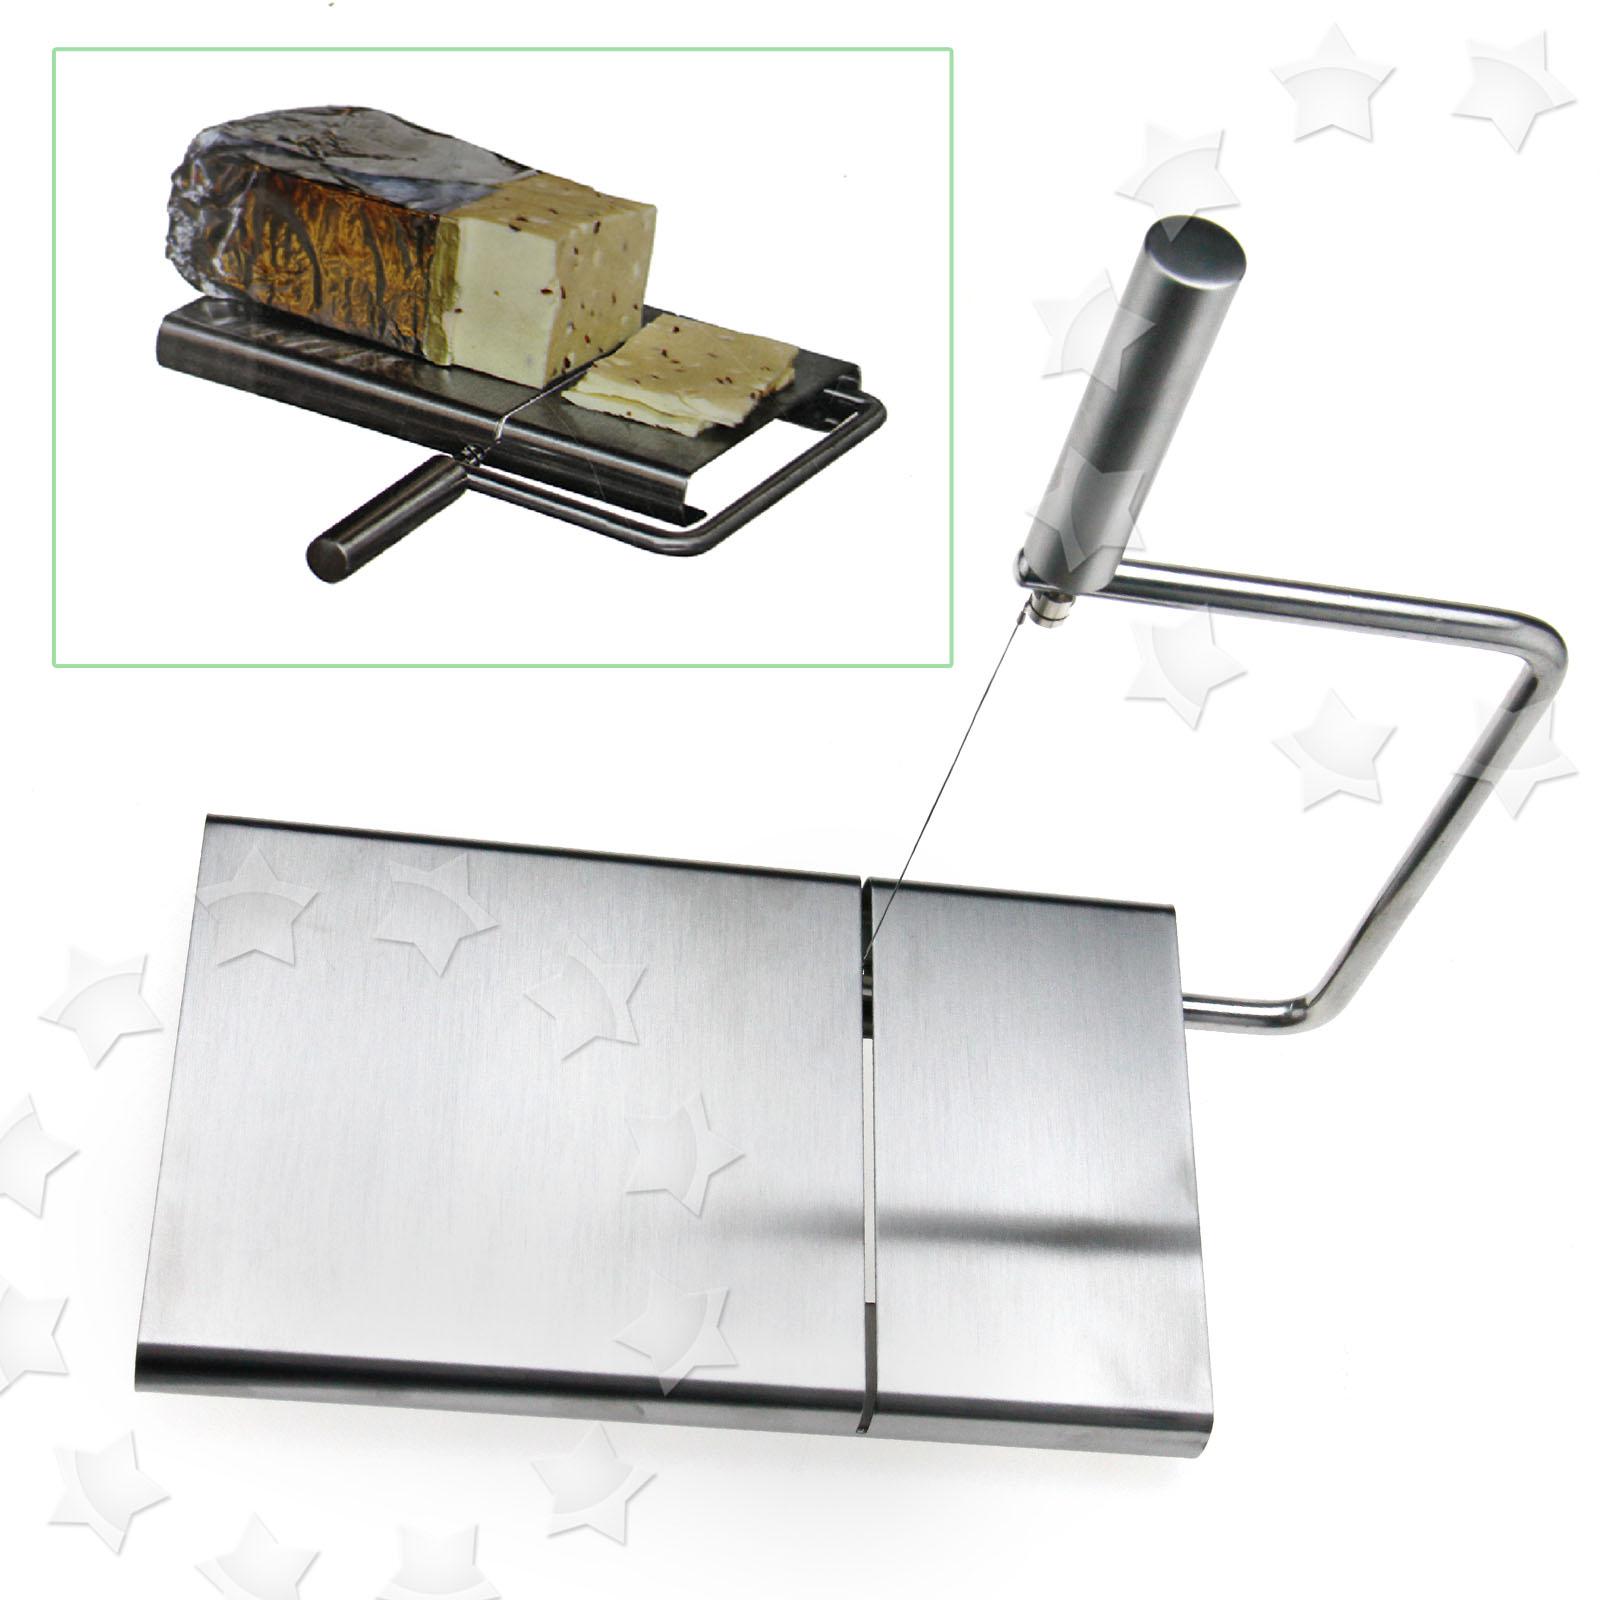 Stainless Steel Wire Cheese Slicer Cutter Board Cutting Kitchen Hand ...